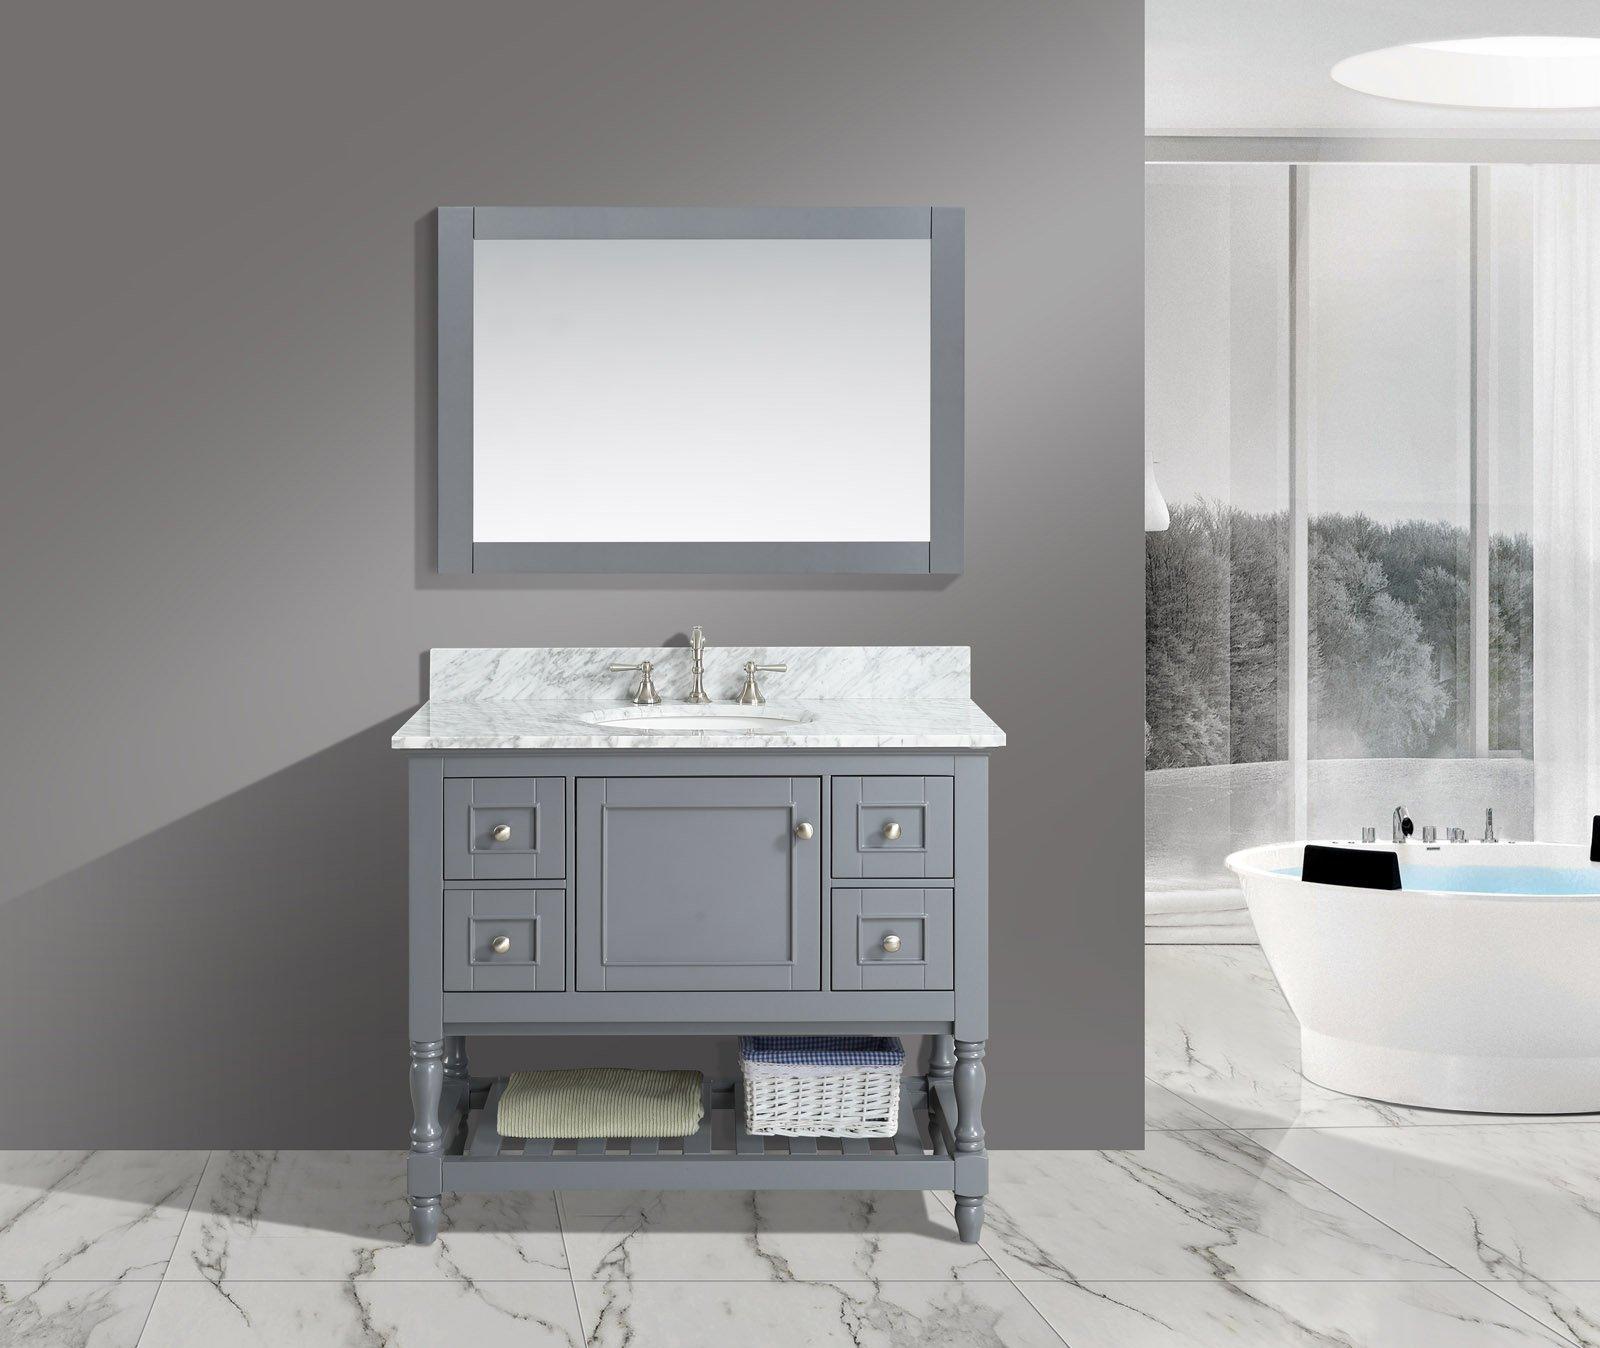 UrbanFurnishing.net - Silvia 42-Inch (42'') Bathroom Sink Vanity Set with White Italian Carrara Marble Top - Charcoal